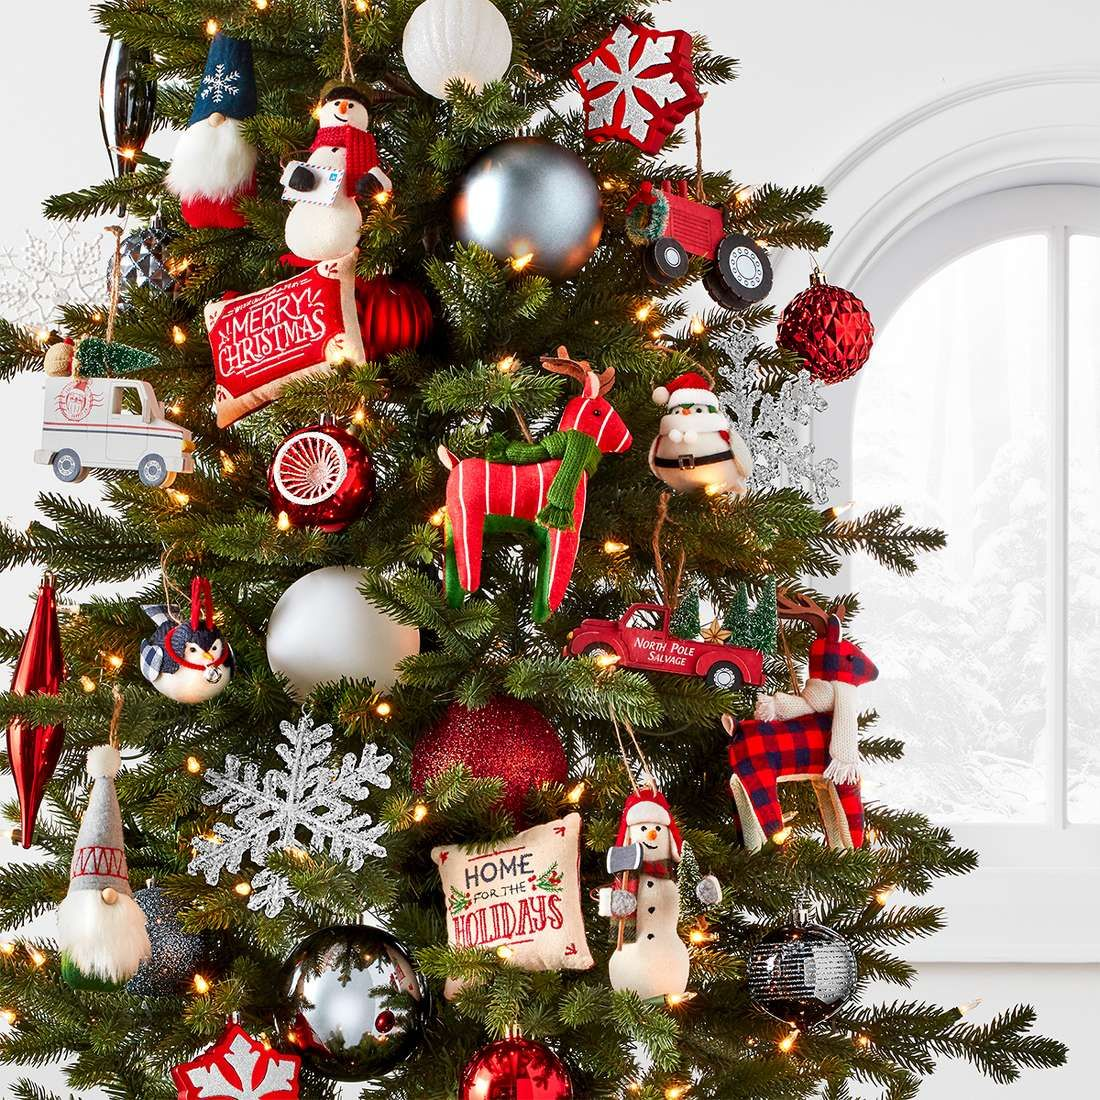 Ho Ho Ho It S The Season For Great Decor Shop Target For Christmas Ornaments Farmhouse Christmas Ornaments Christmas Ornament Sets Amazing Christmas Trees